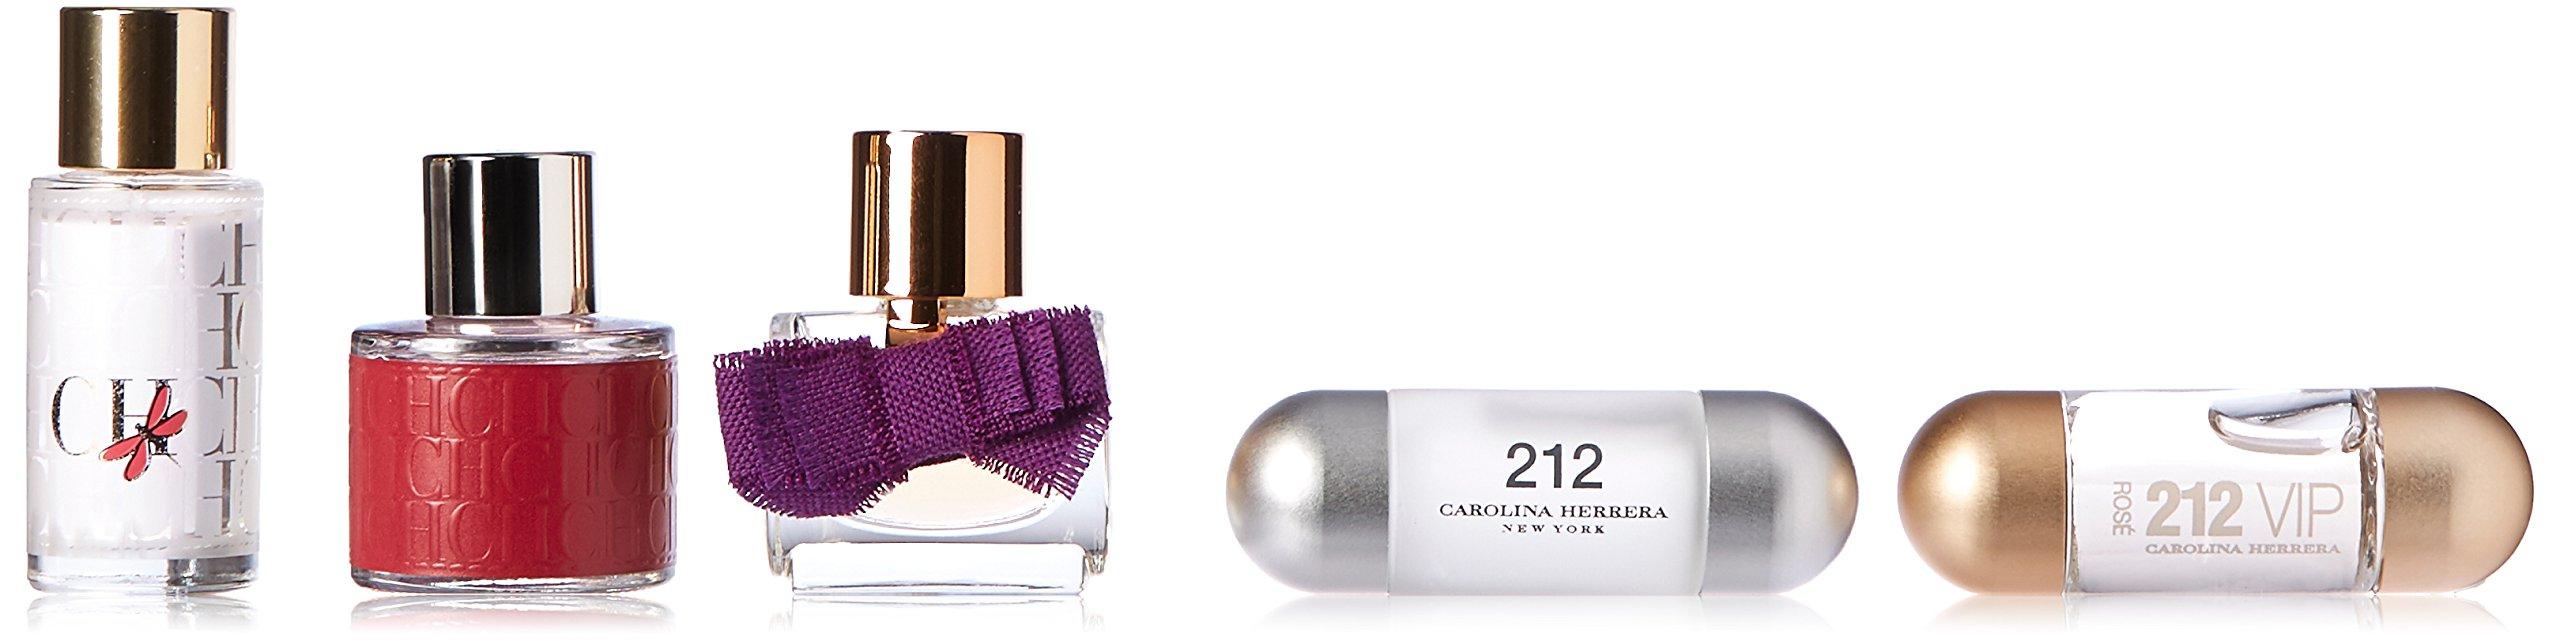 Carolina Herrera Fragrance Set for Women